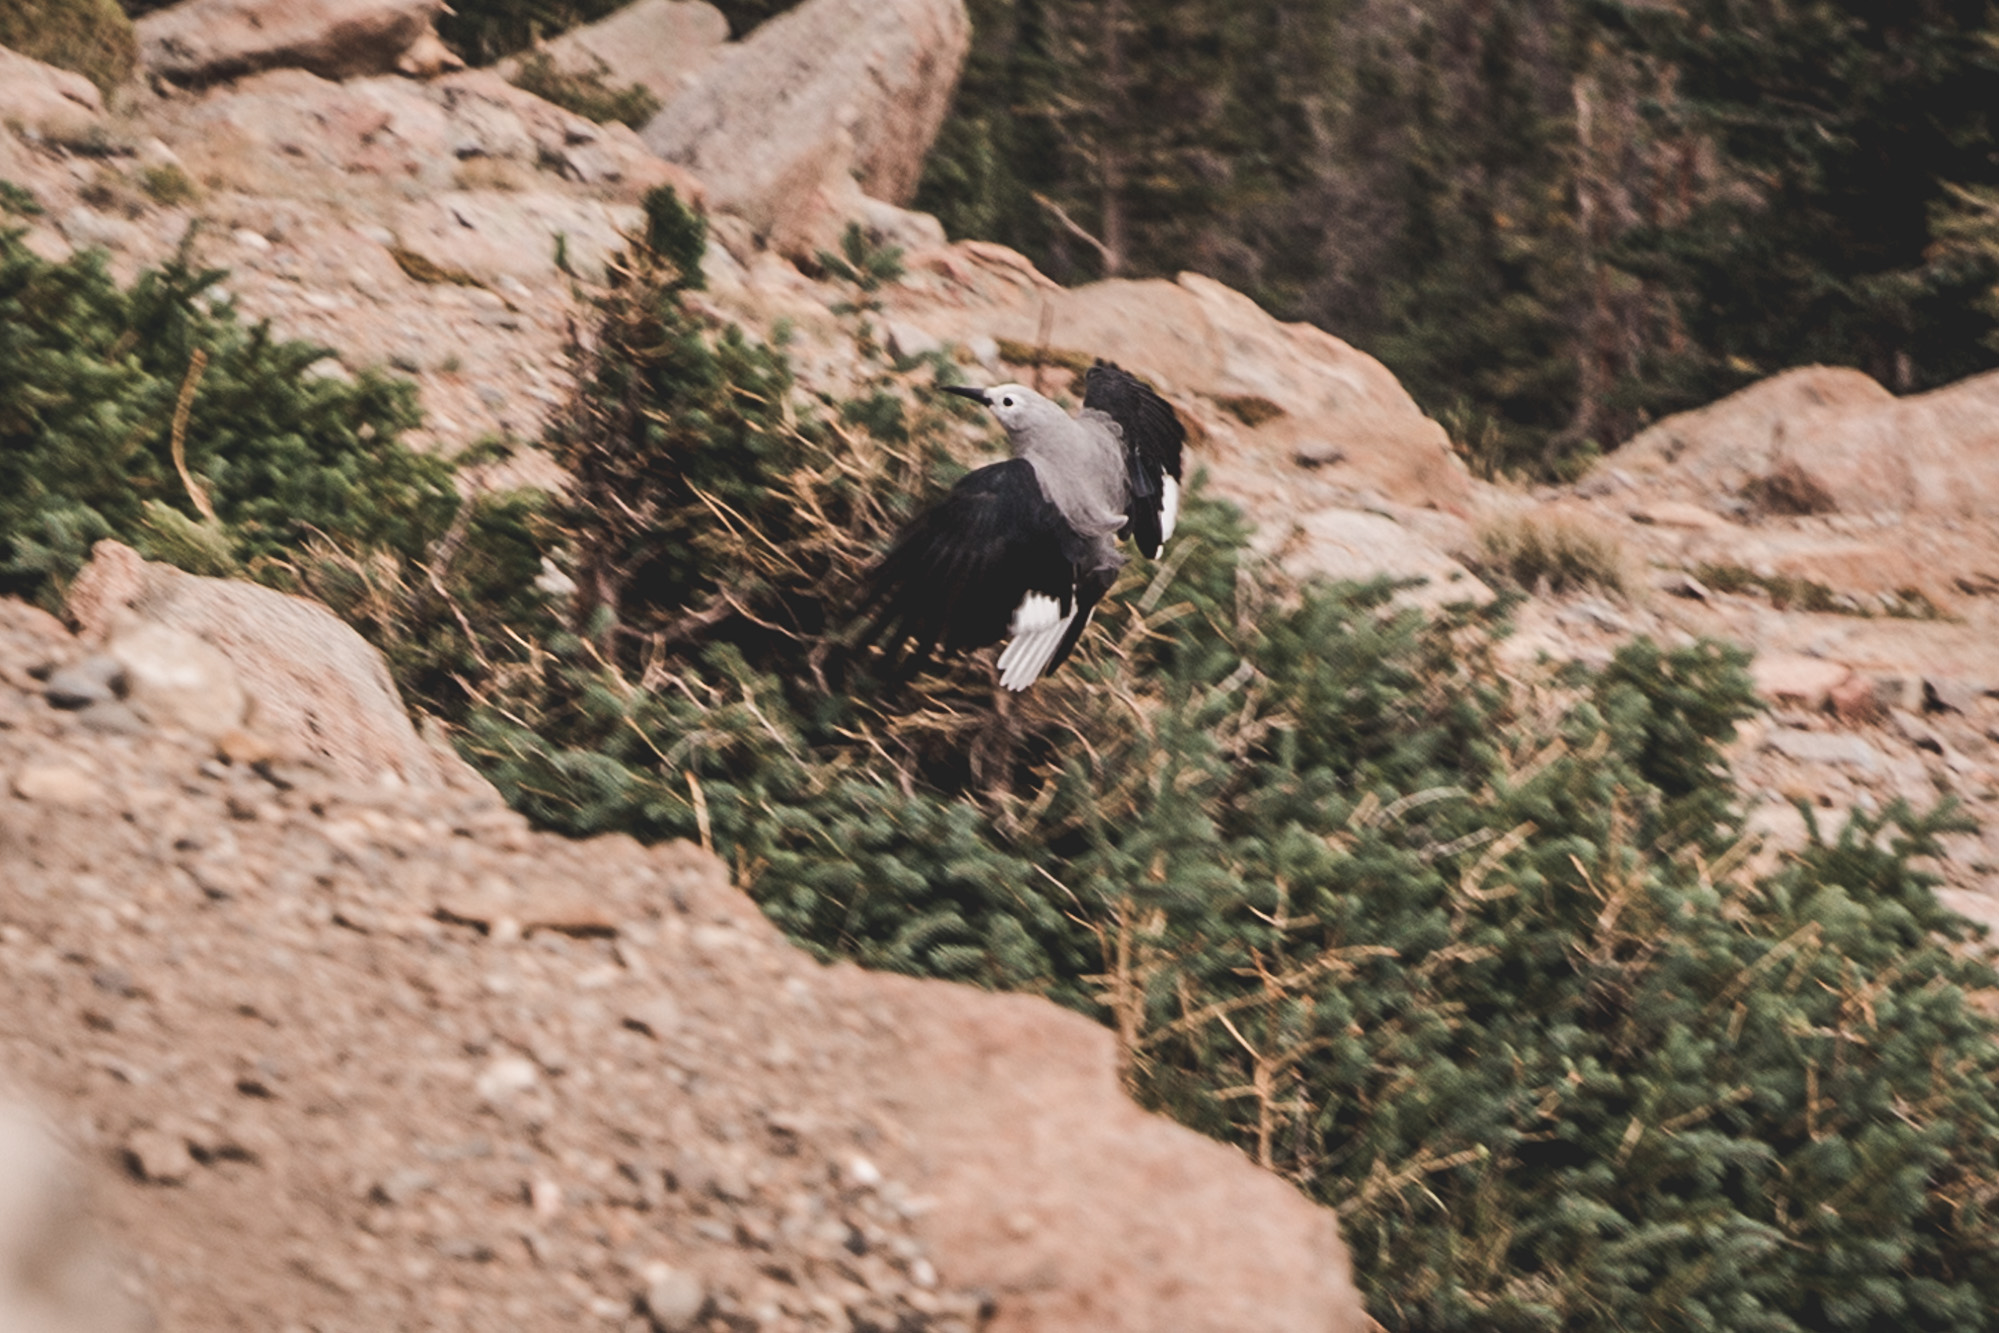 Clark's Nutcracker flying at the Rainbow Curve Overlook in Rocky Mountain National Park